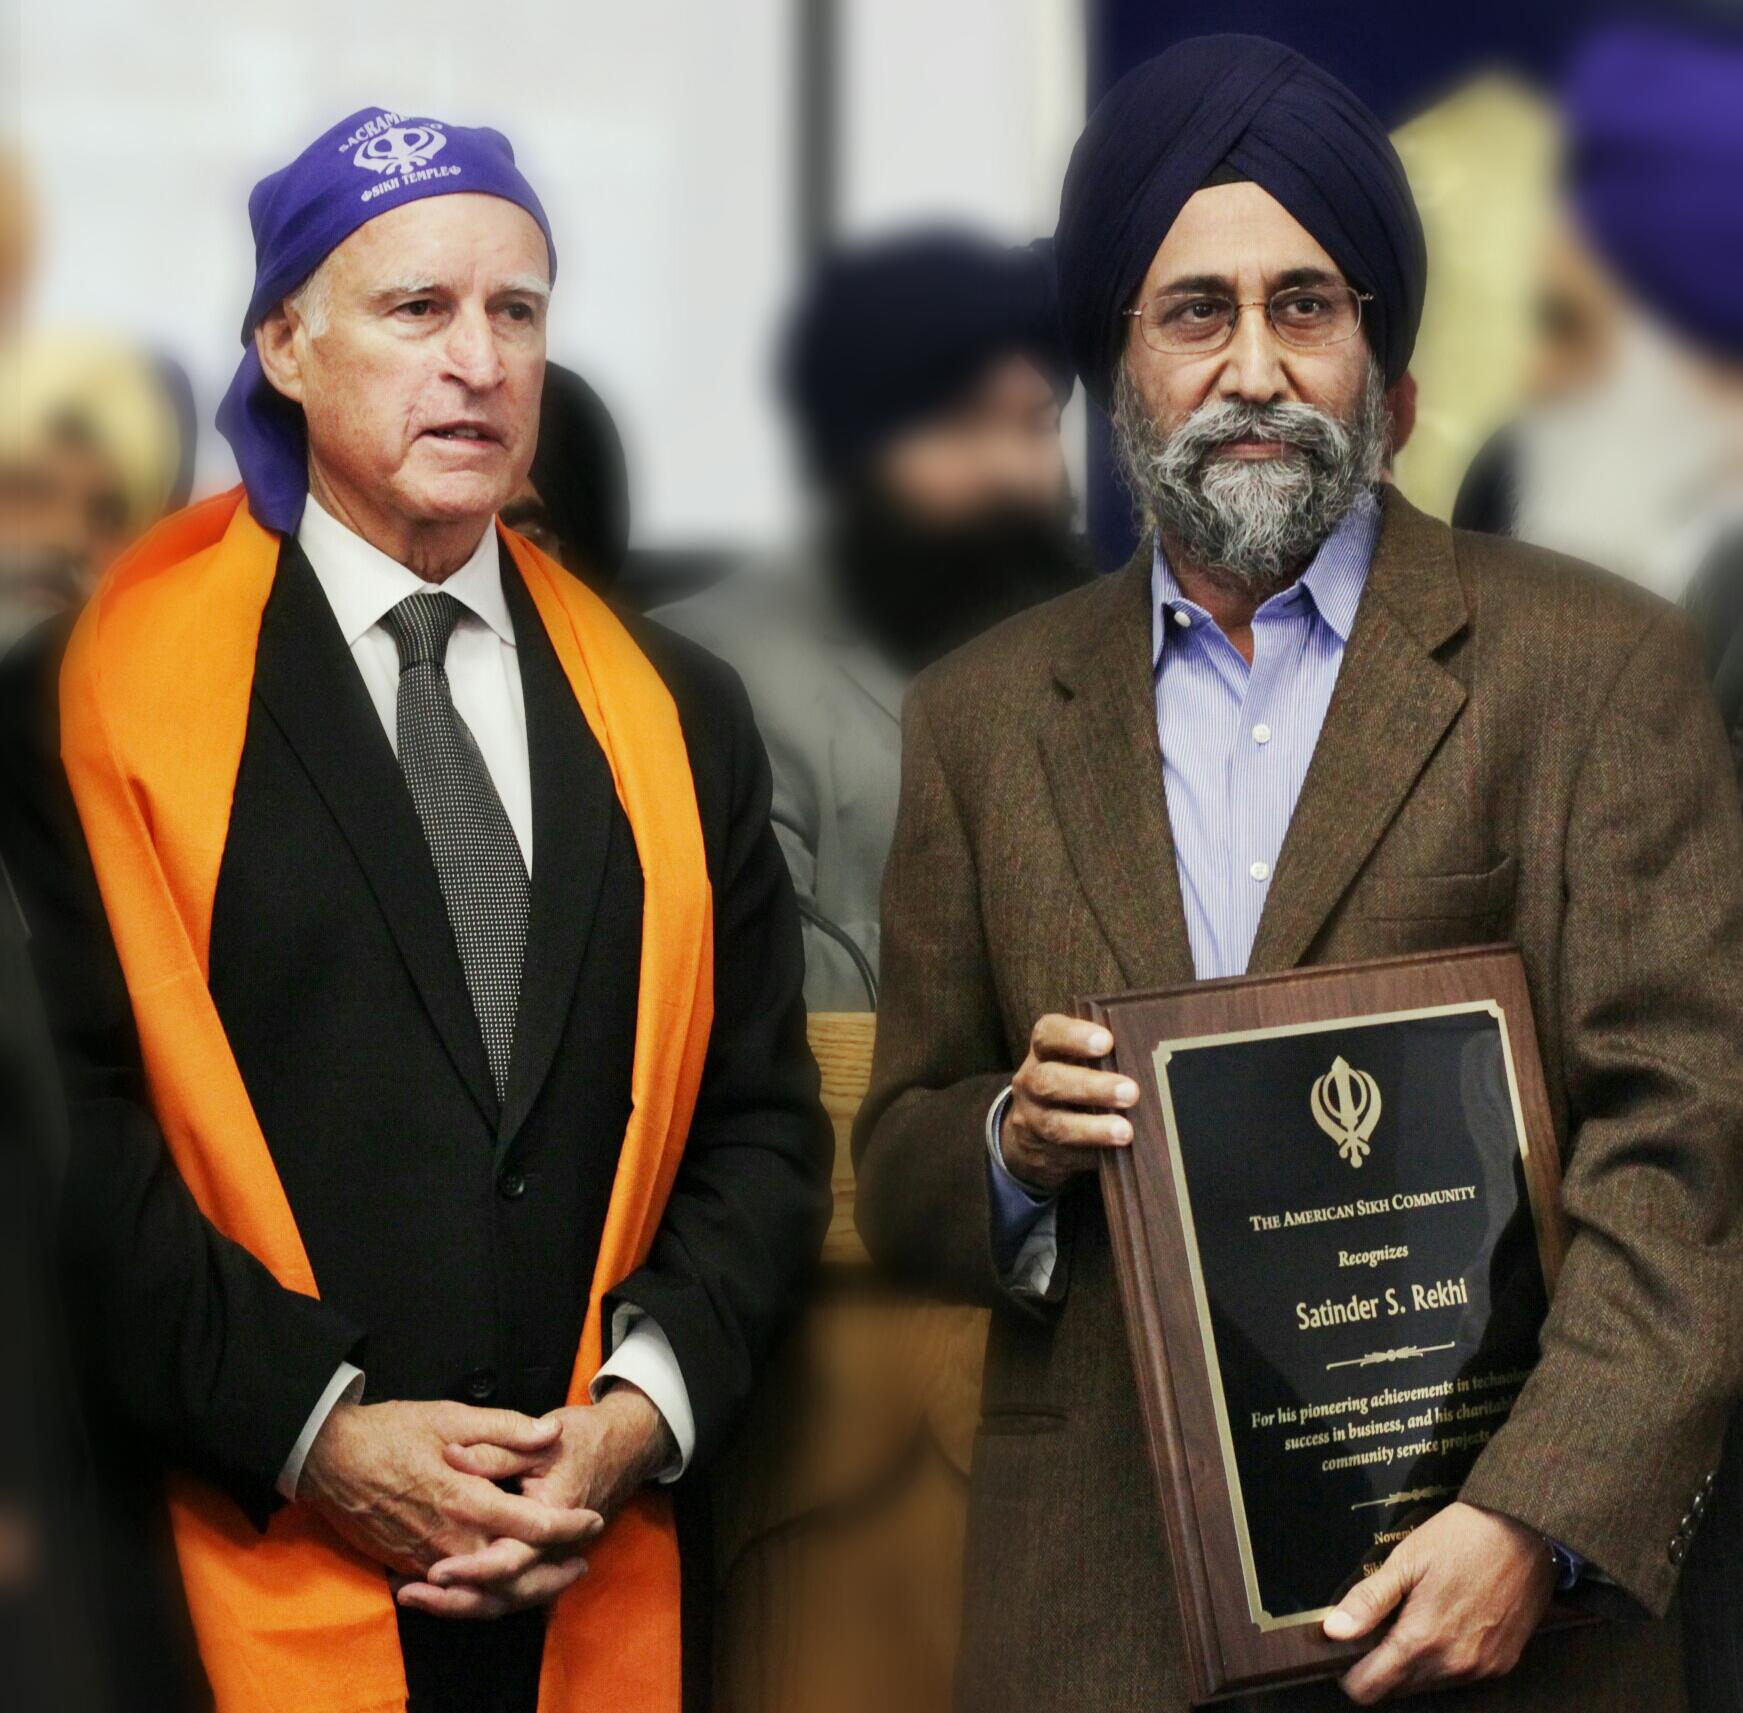 Governor Jerry Brown and Satinder Singh Rekhi,